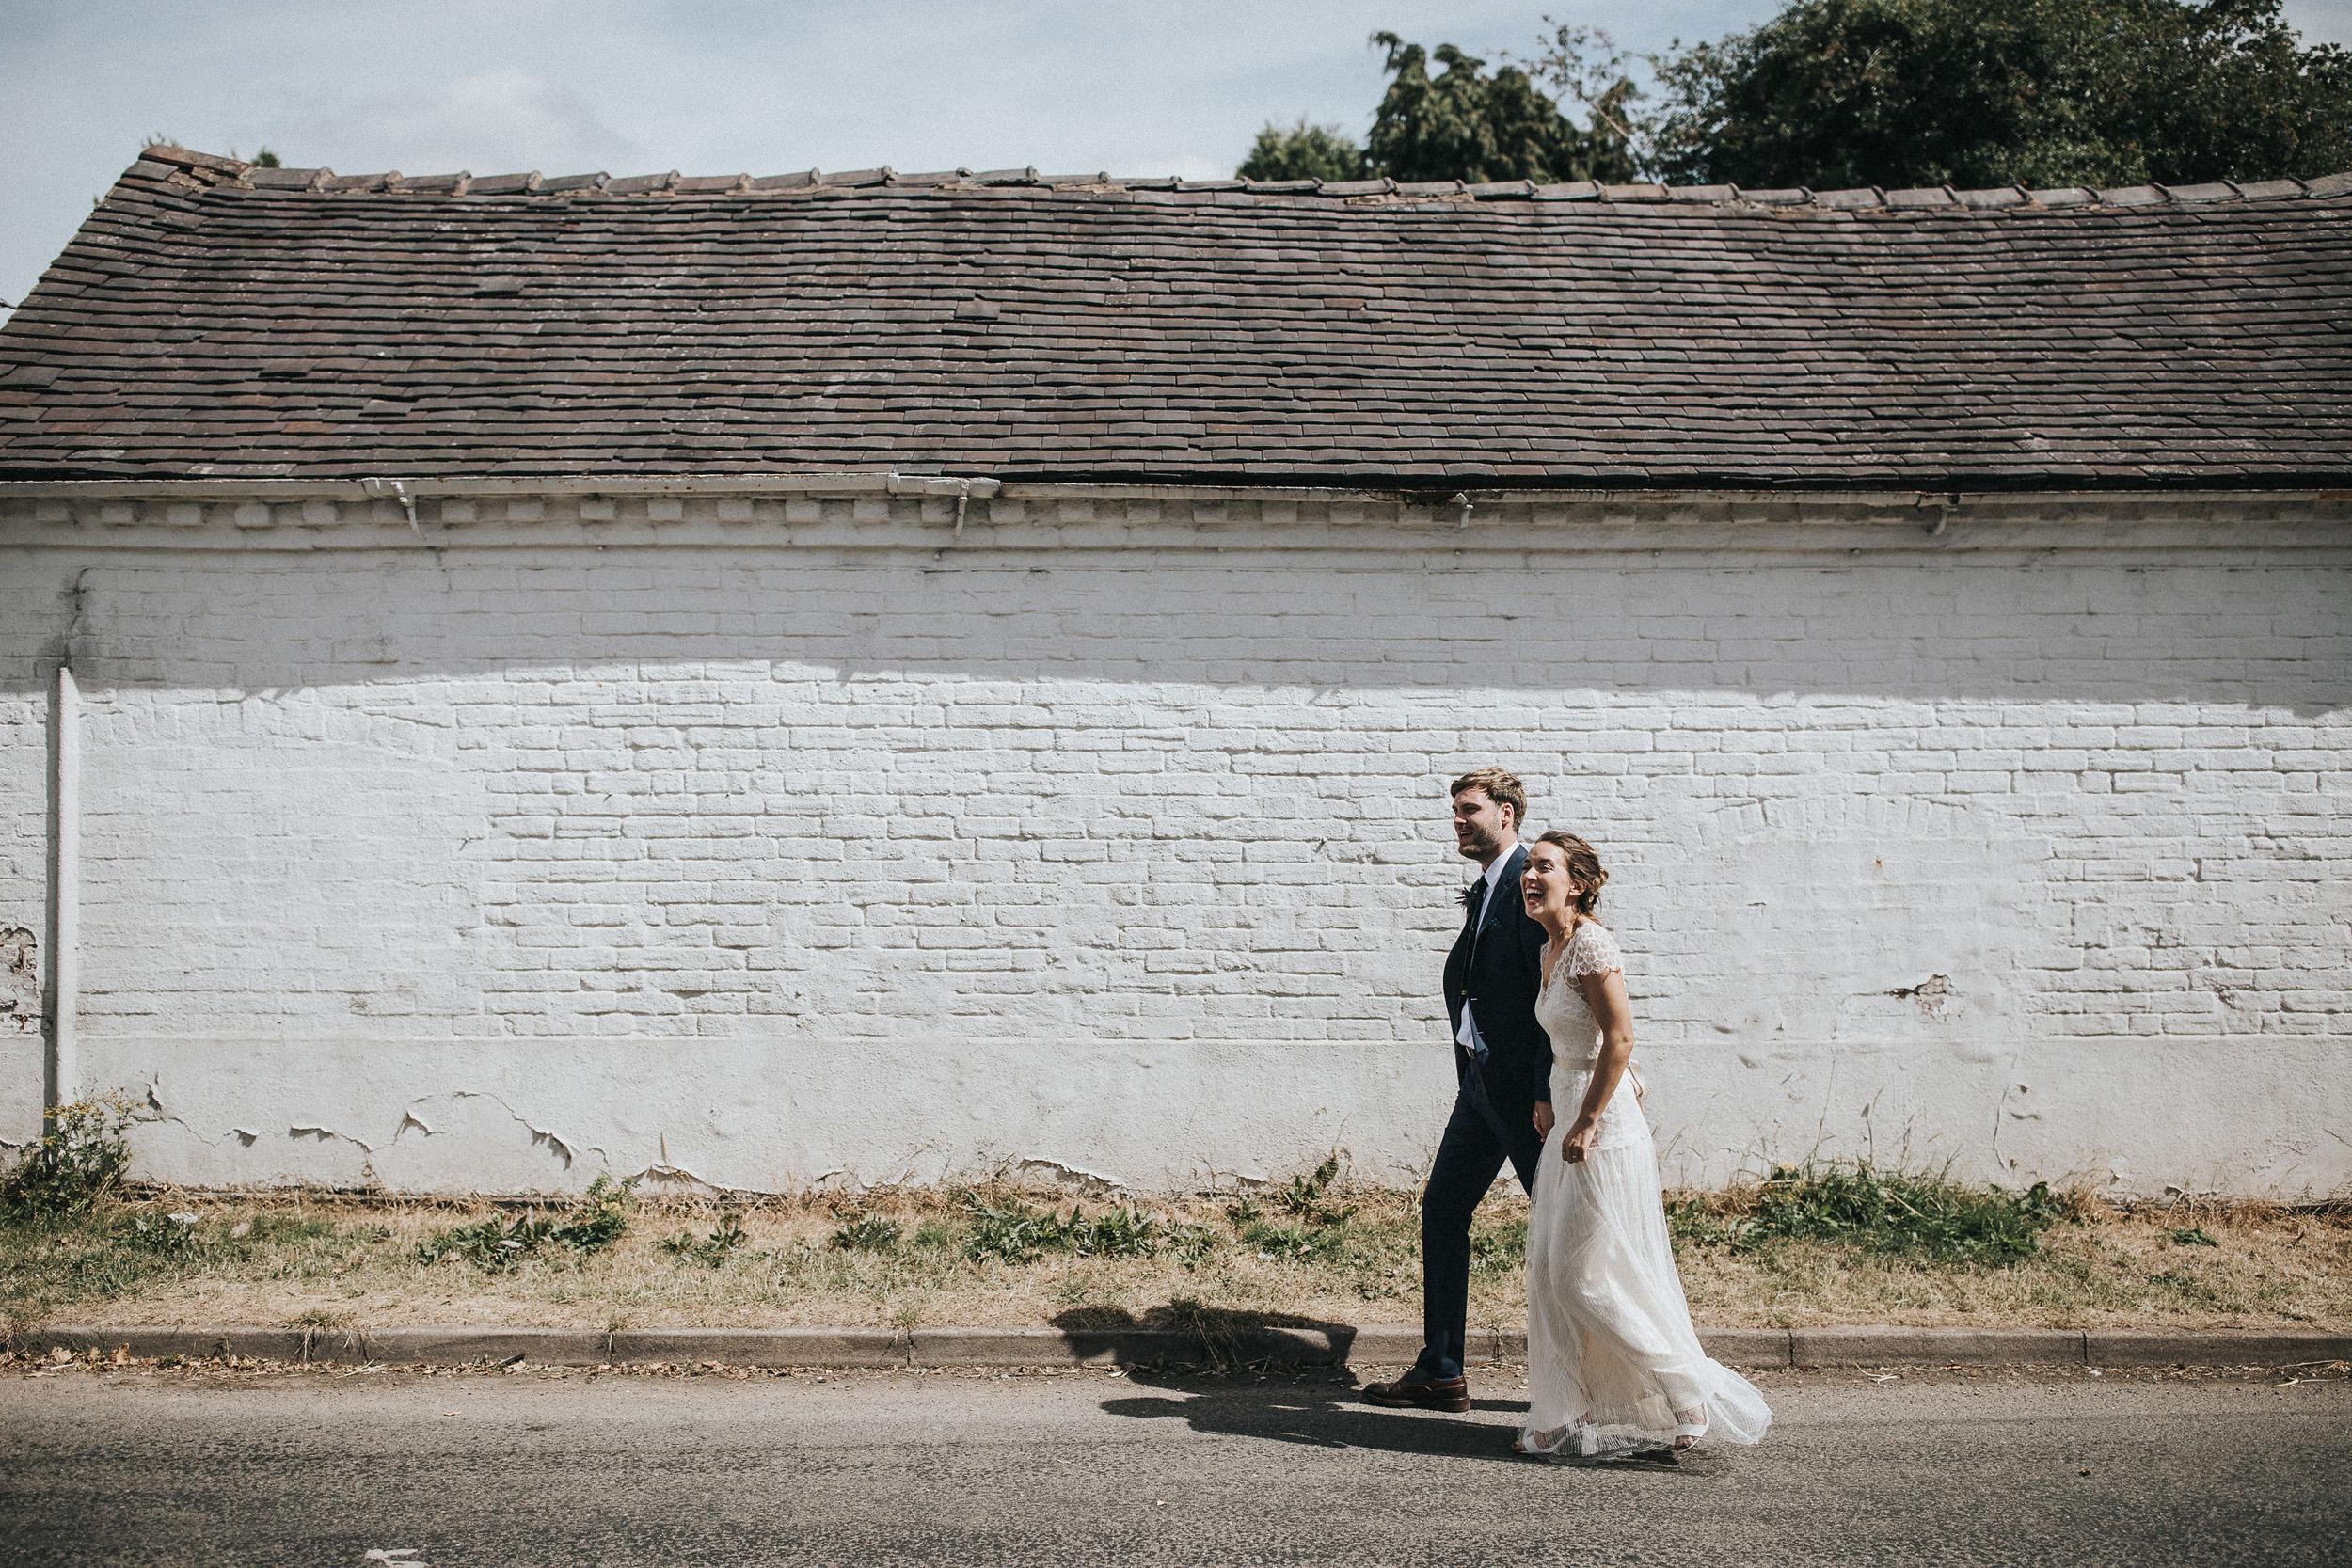 Martha-Laid-Back-Garden-Wedding-Lace-Wedding-Dress-Bohemian-Kate-Beaumont-28.jpg